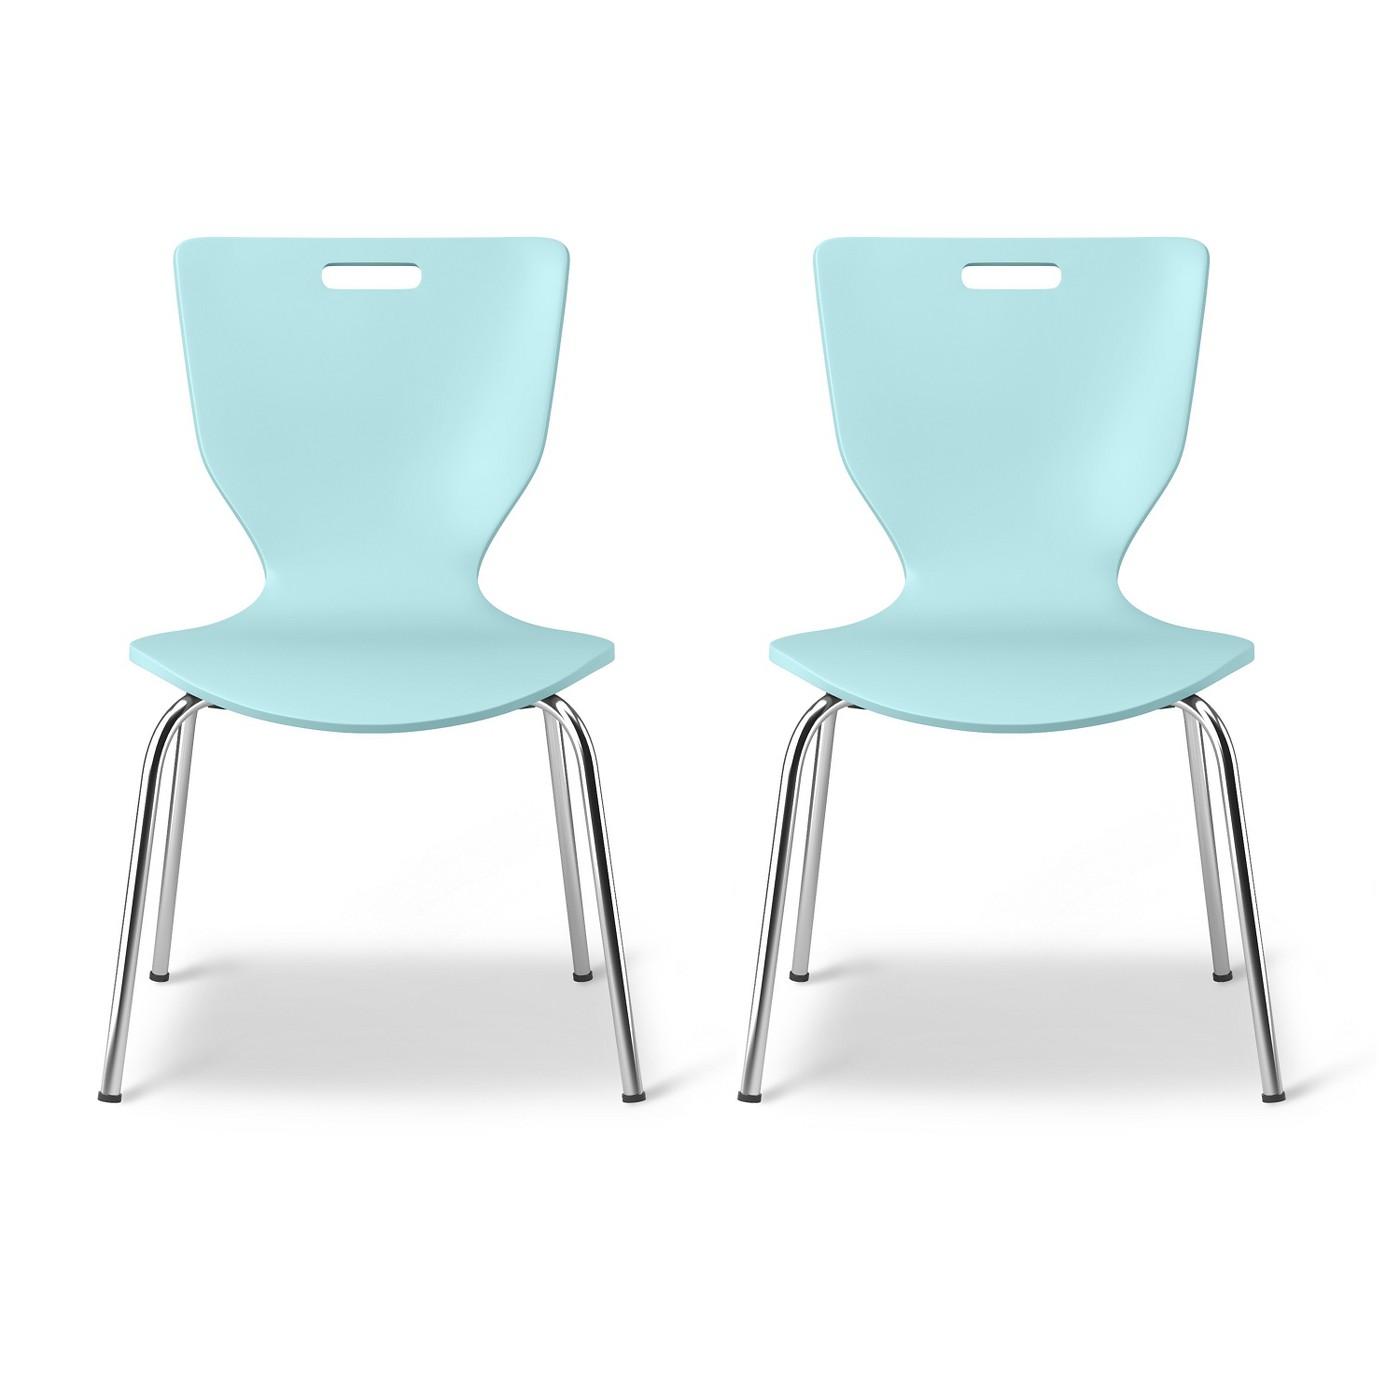 Scoop Kids Activity Chair - Seafoam Green (Set of 2) - Pillowfort™ - image 1 of 4